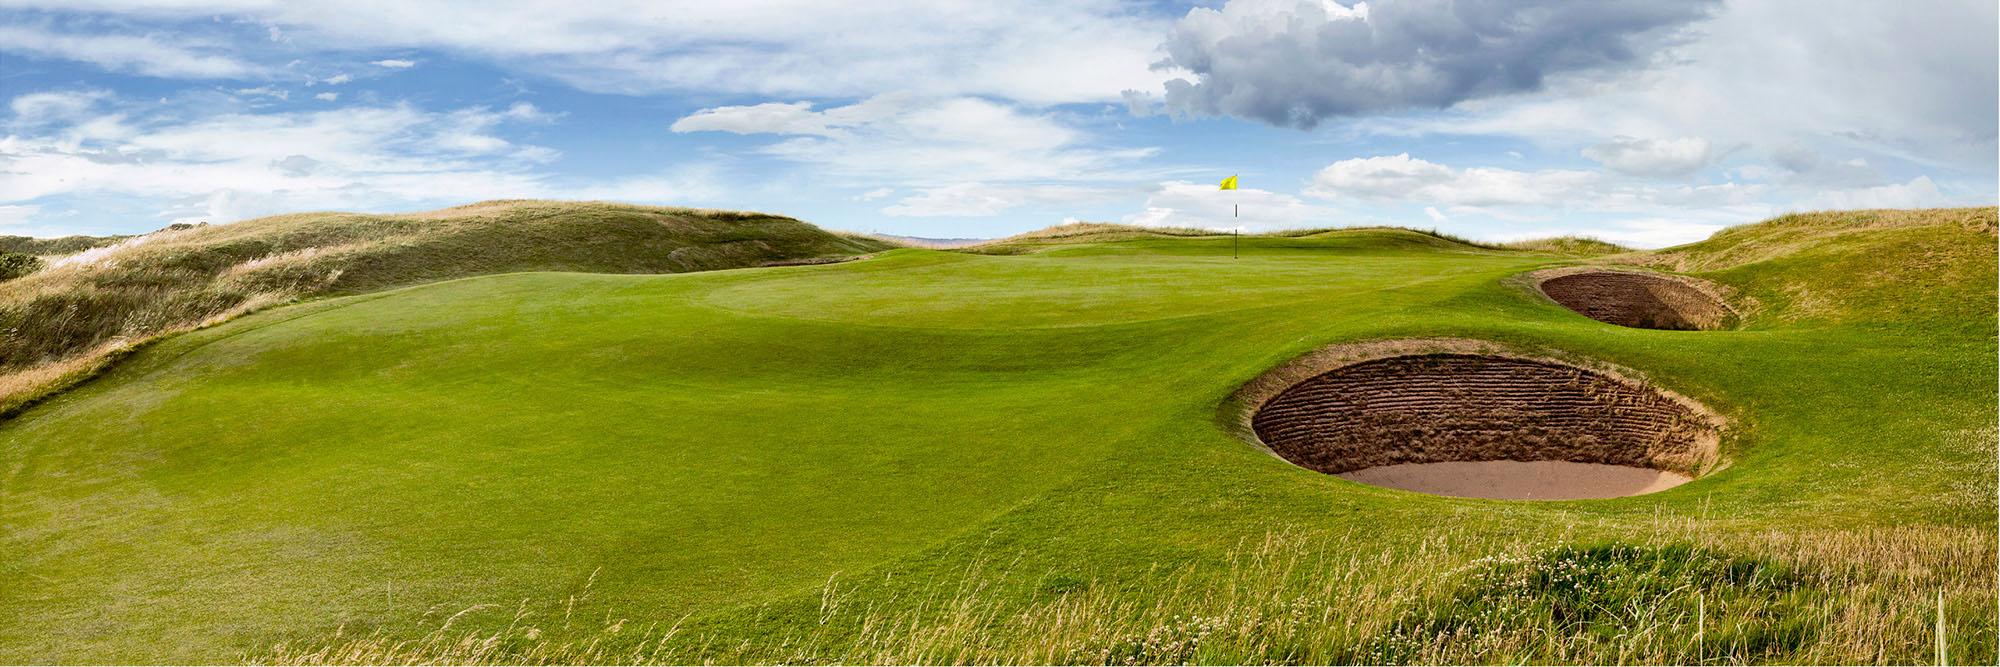 Golf Course Image - Muirfield No. 13